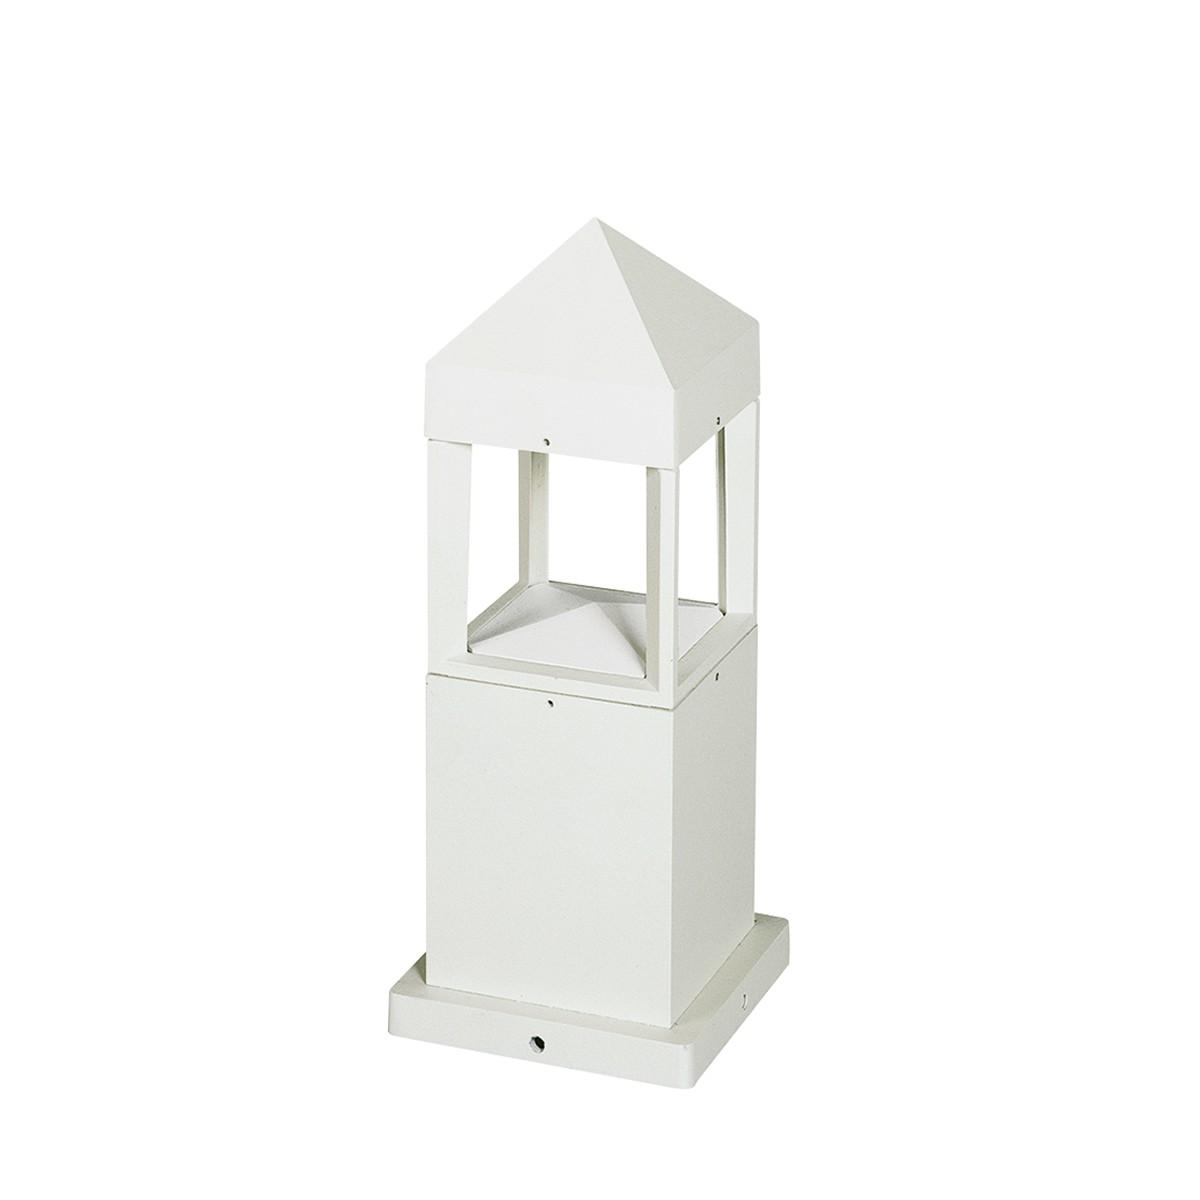 Albert 0599 Sockelleuchte LED, weiß